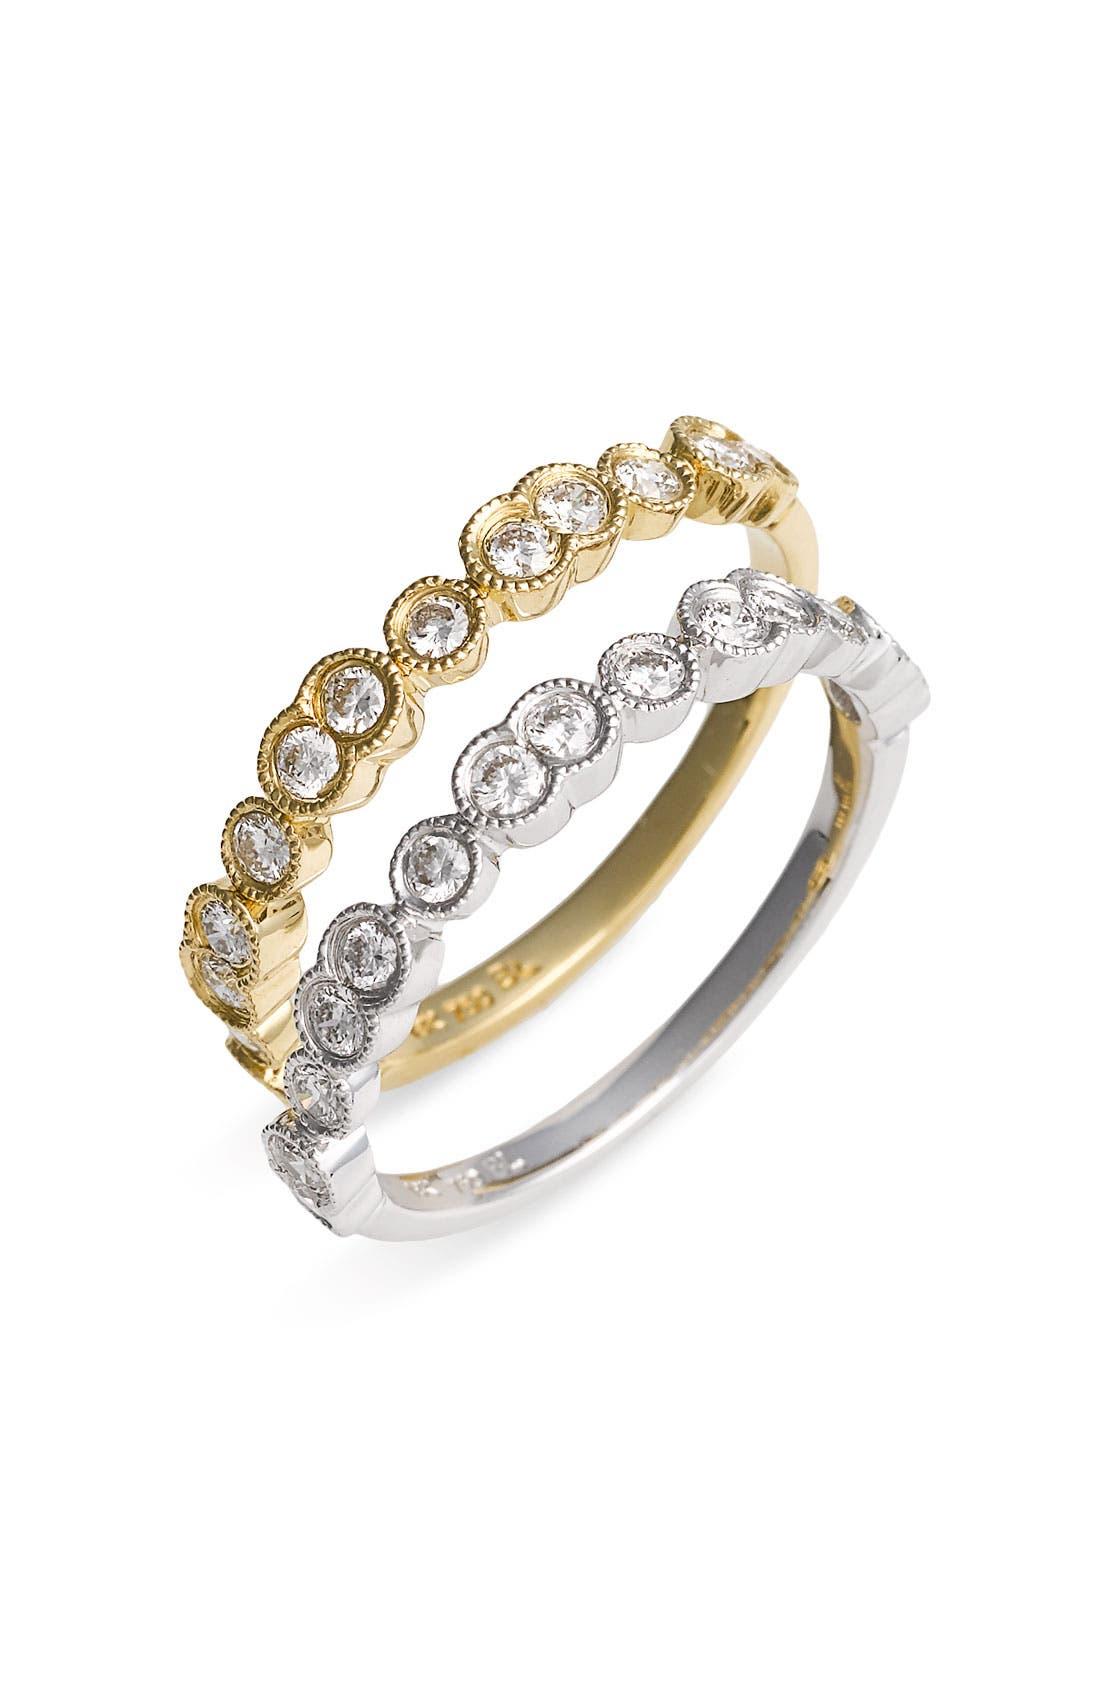 Main Image - Bony Levy Stackable Bezel Set Diamond Ring (Nordstrom Exclusive)